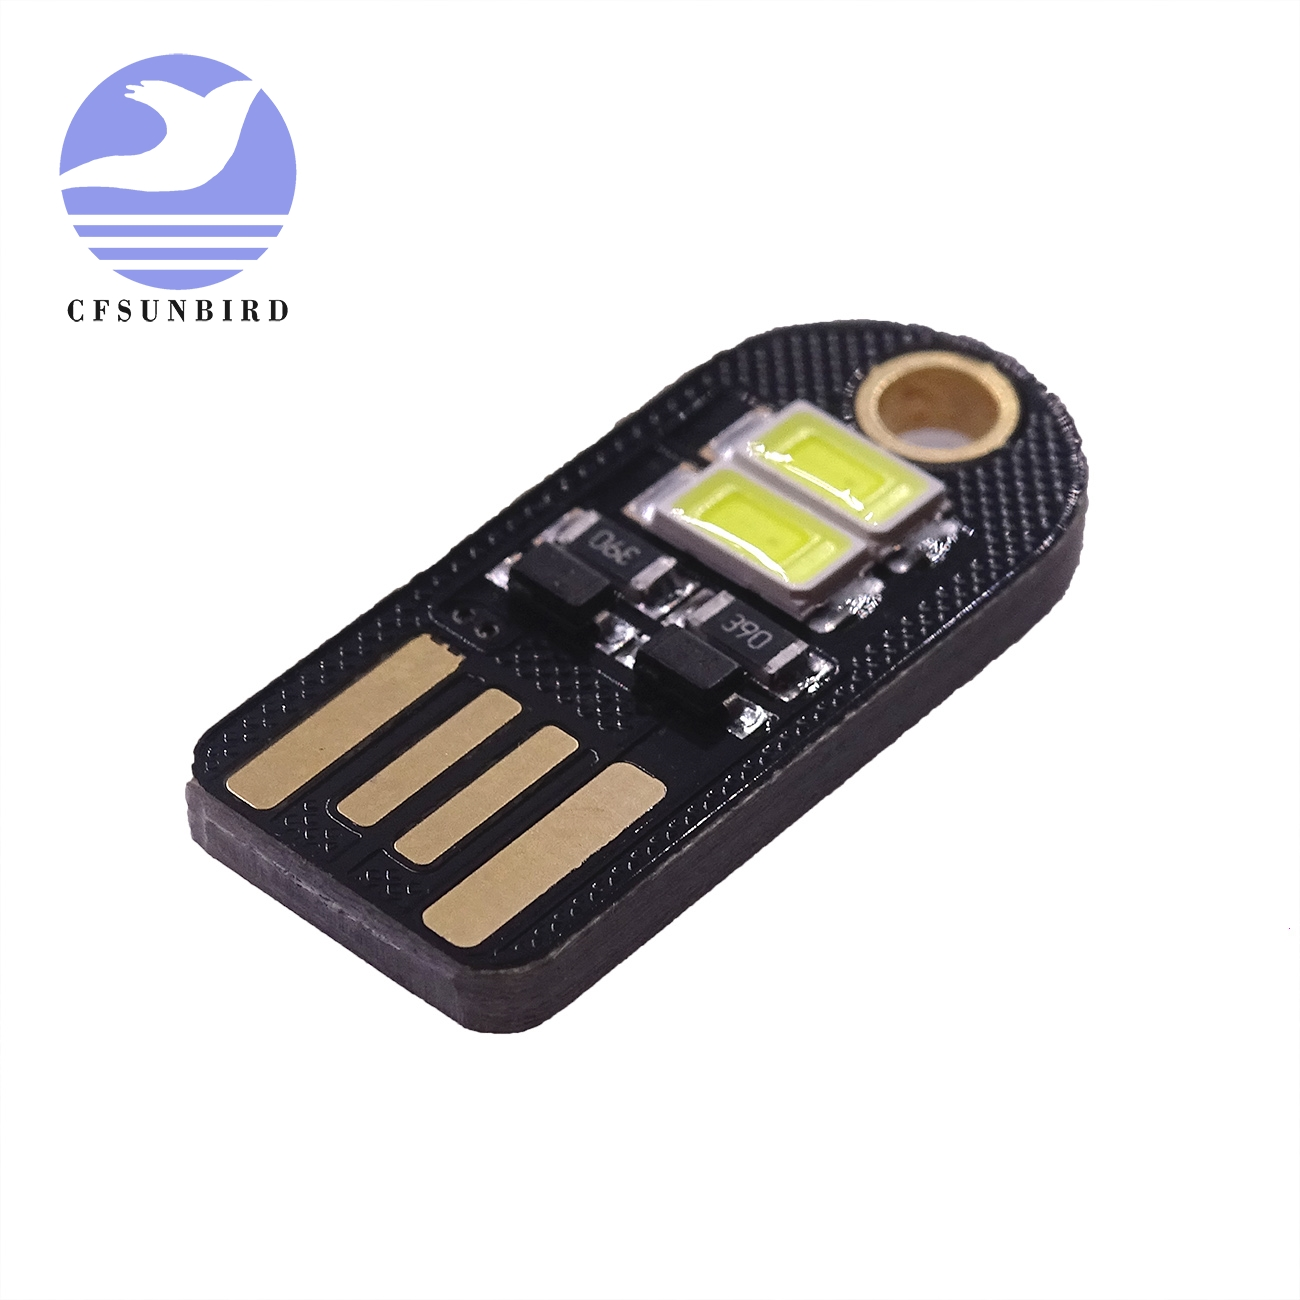 5Pcs Bulb Card Lamp Keychain White Pocket Mini USB Touch switch 4LED Night Light